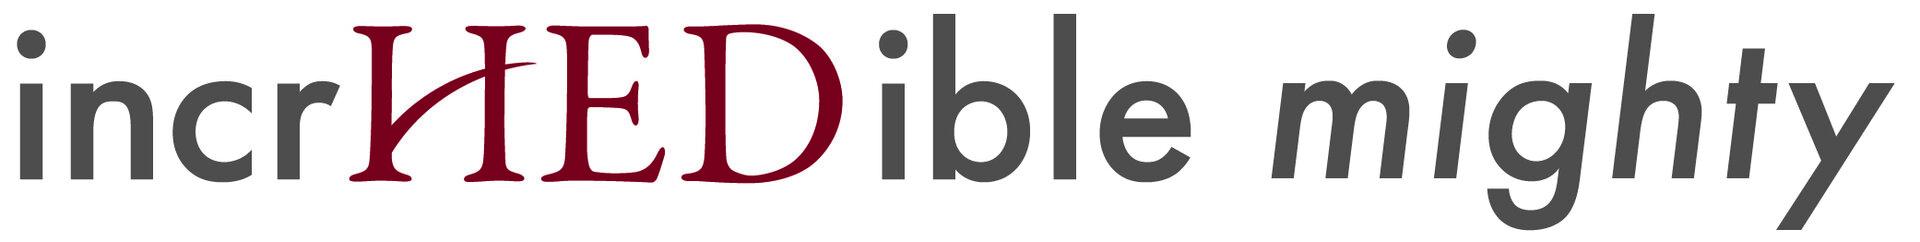 8017-20-5_incrHEDiblemighty_Logo_Farbe